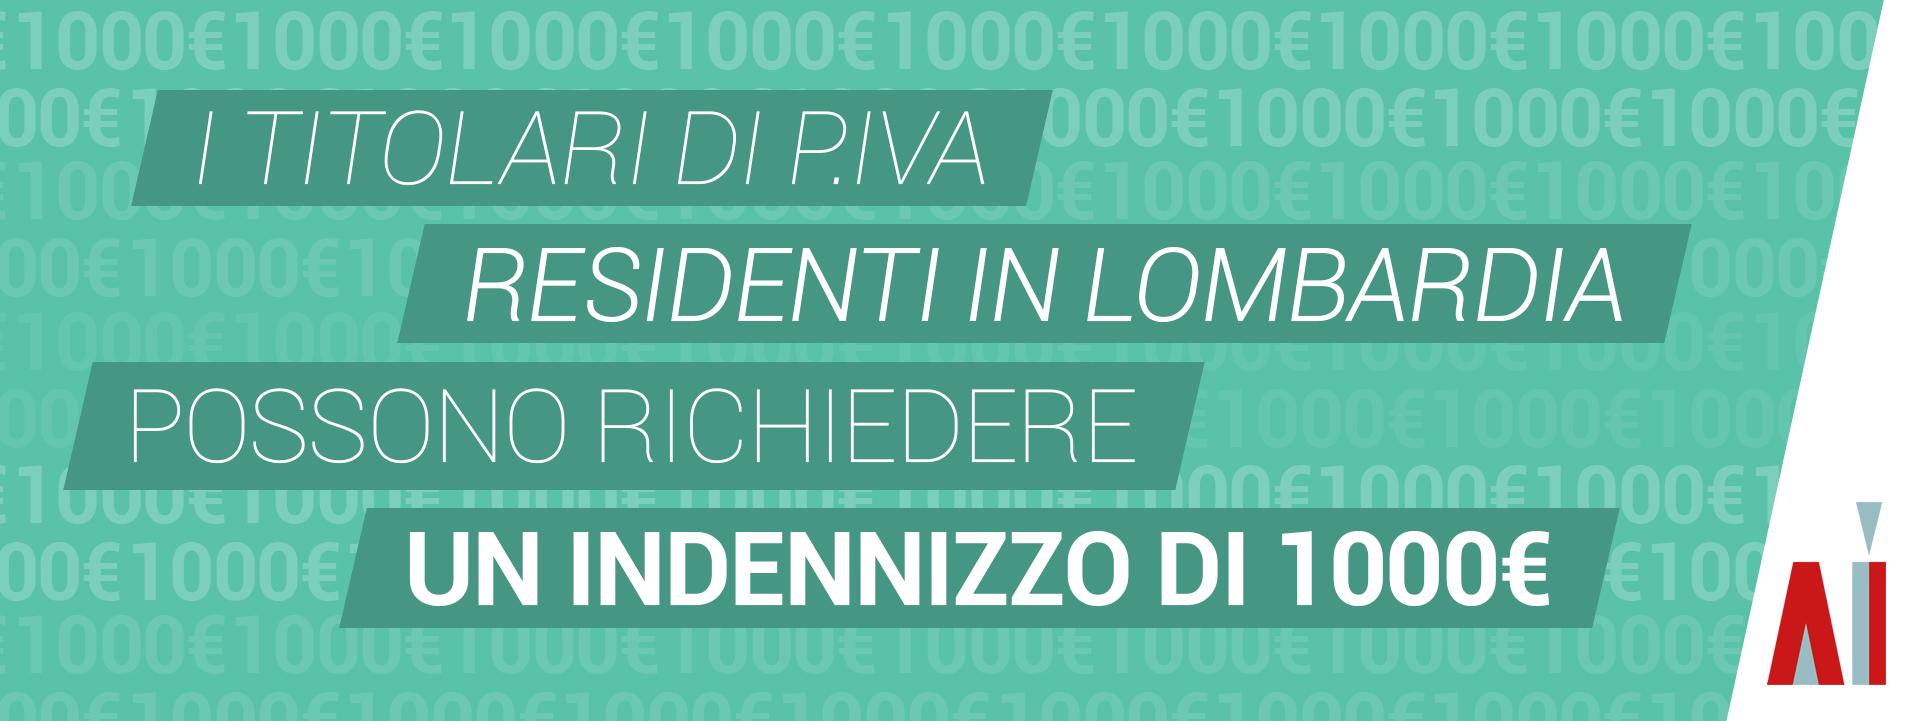 banner indennizzi lombradia6b